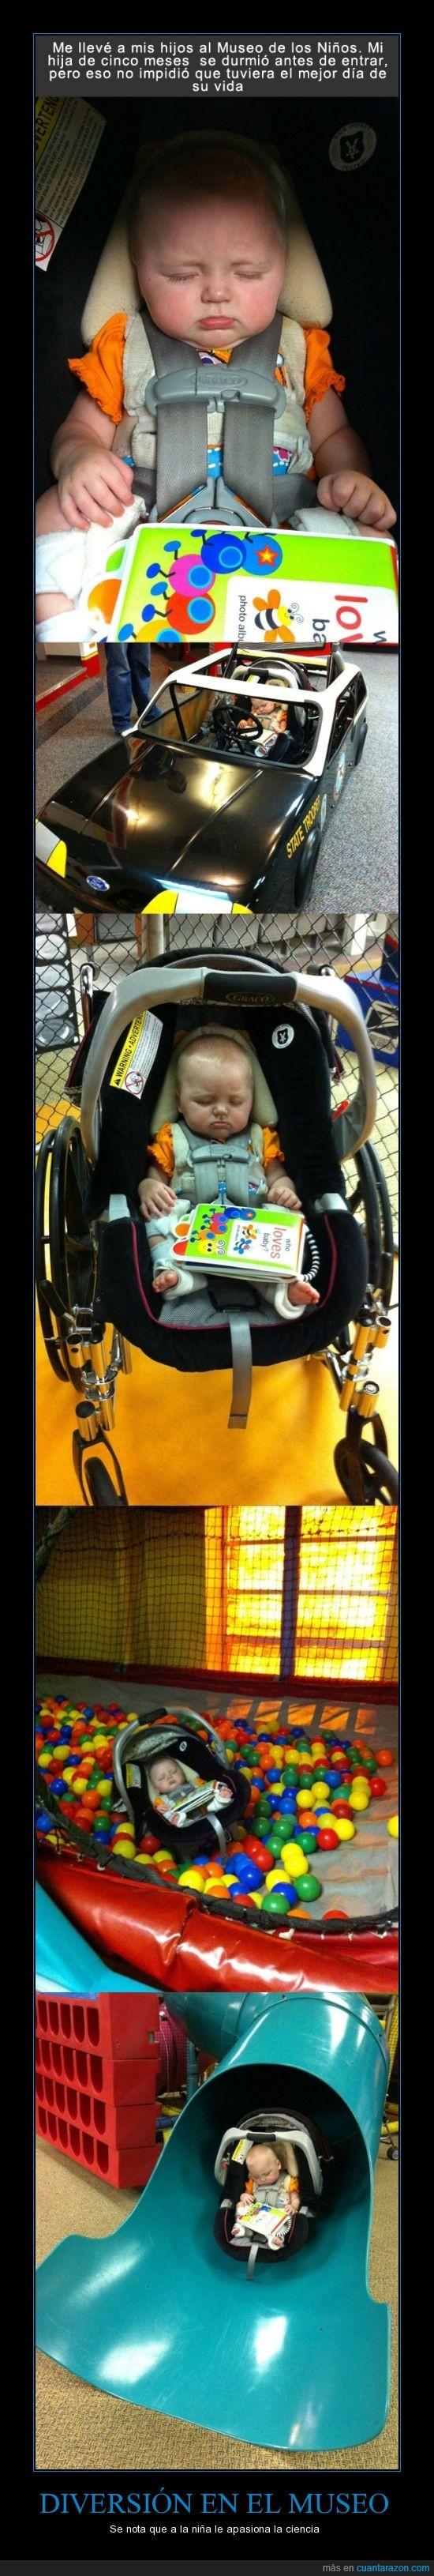 bebe,bolas,cinco meses,dormida,dormir,niña,padre,pequeña,piscina,tobogan